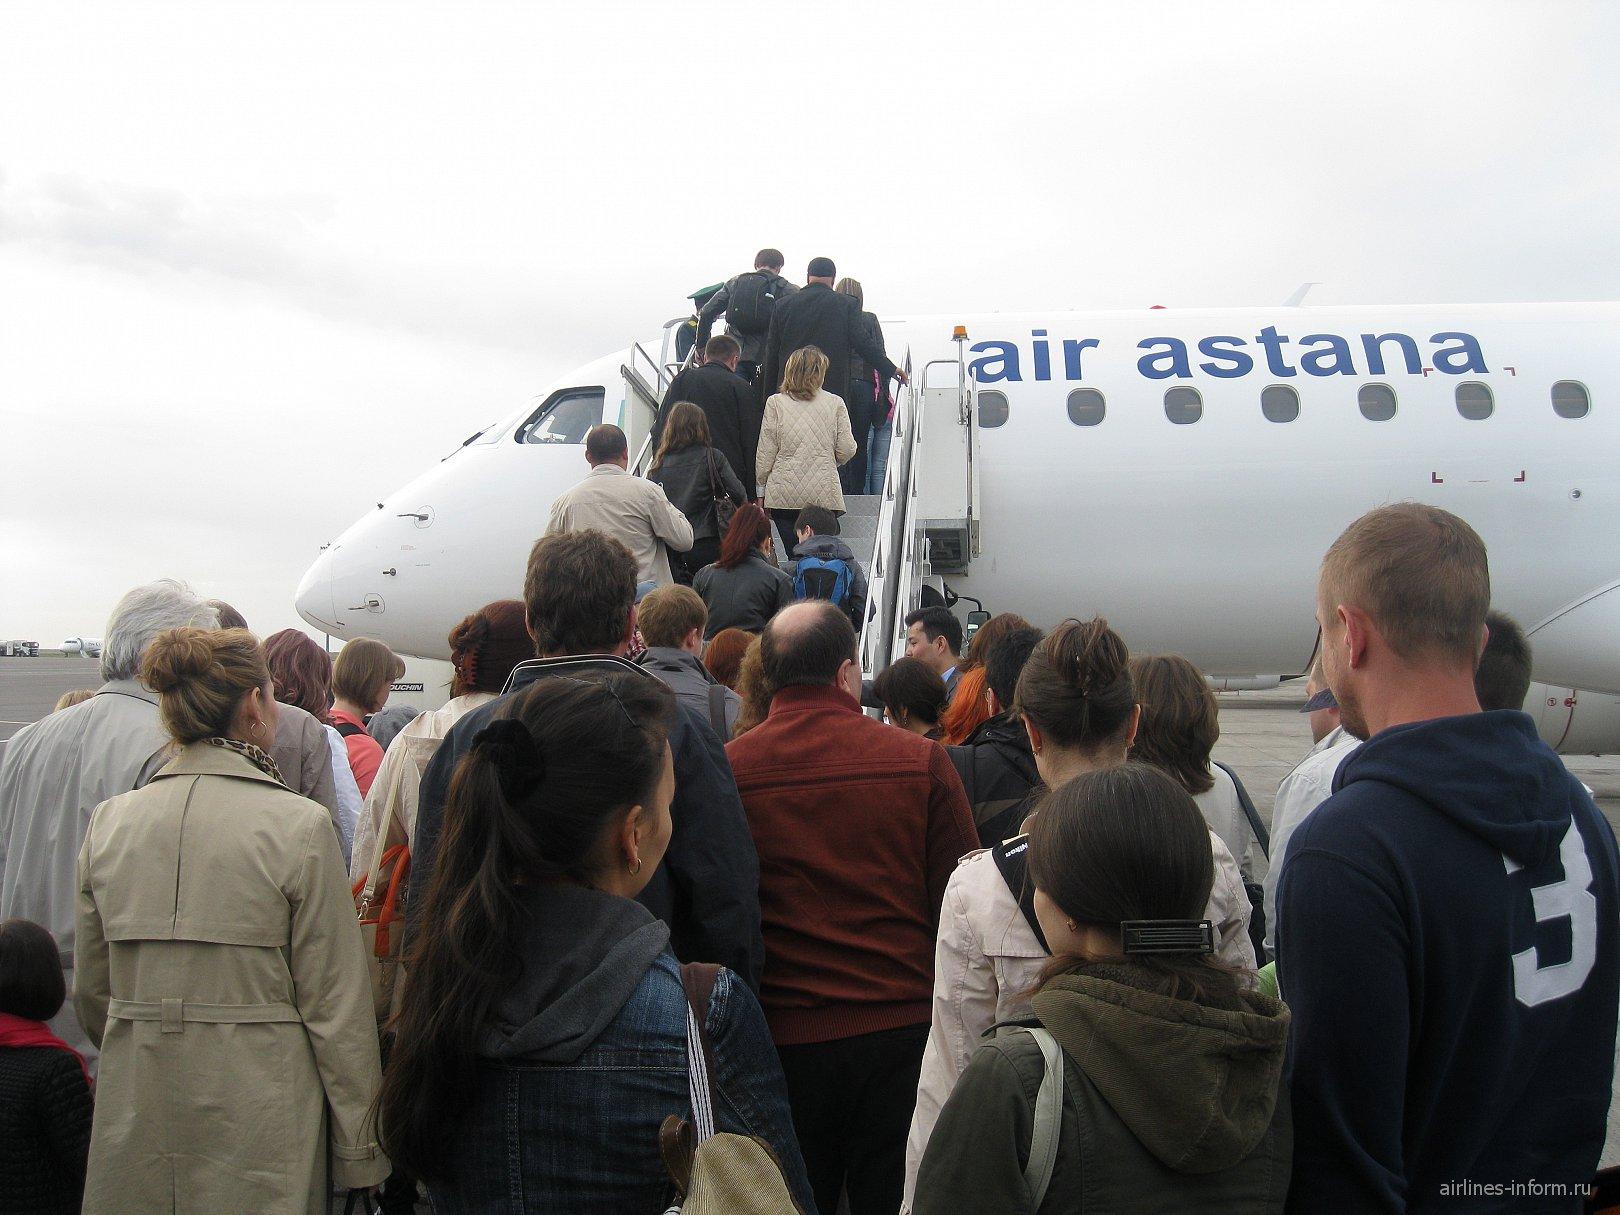 Посадка на рейс Астана-Санкт-Петербург авиакомпании Air Astana